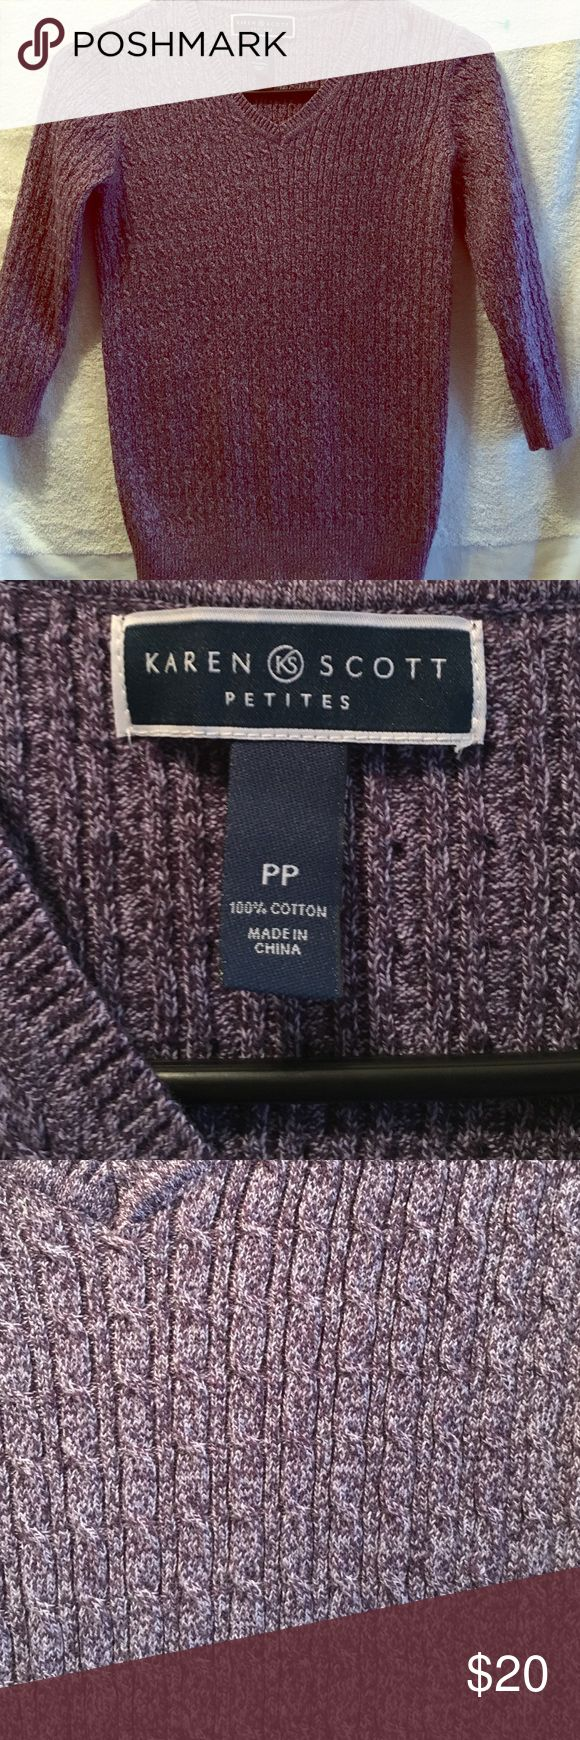 Karen Scott petites sweater 3/4 sleeve cotton Karen Scott Sweaters V-Necks